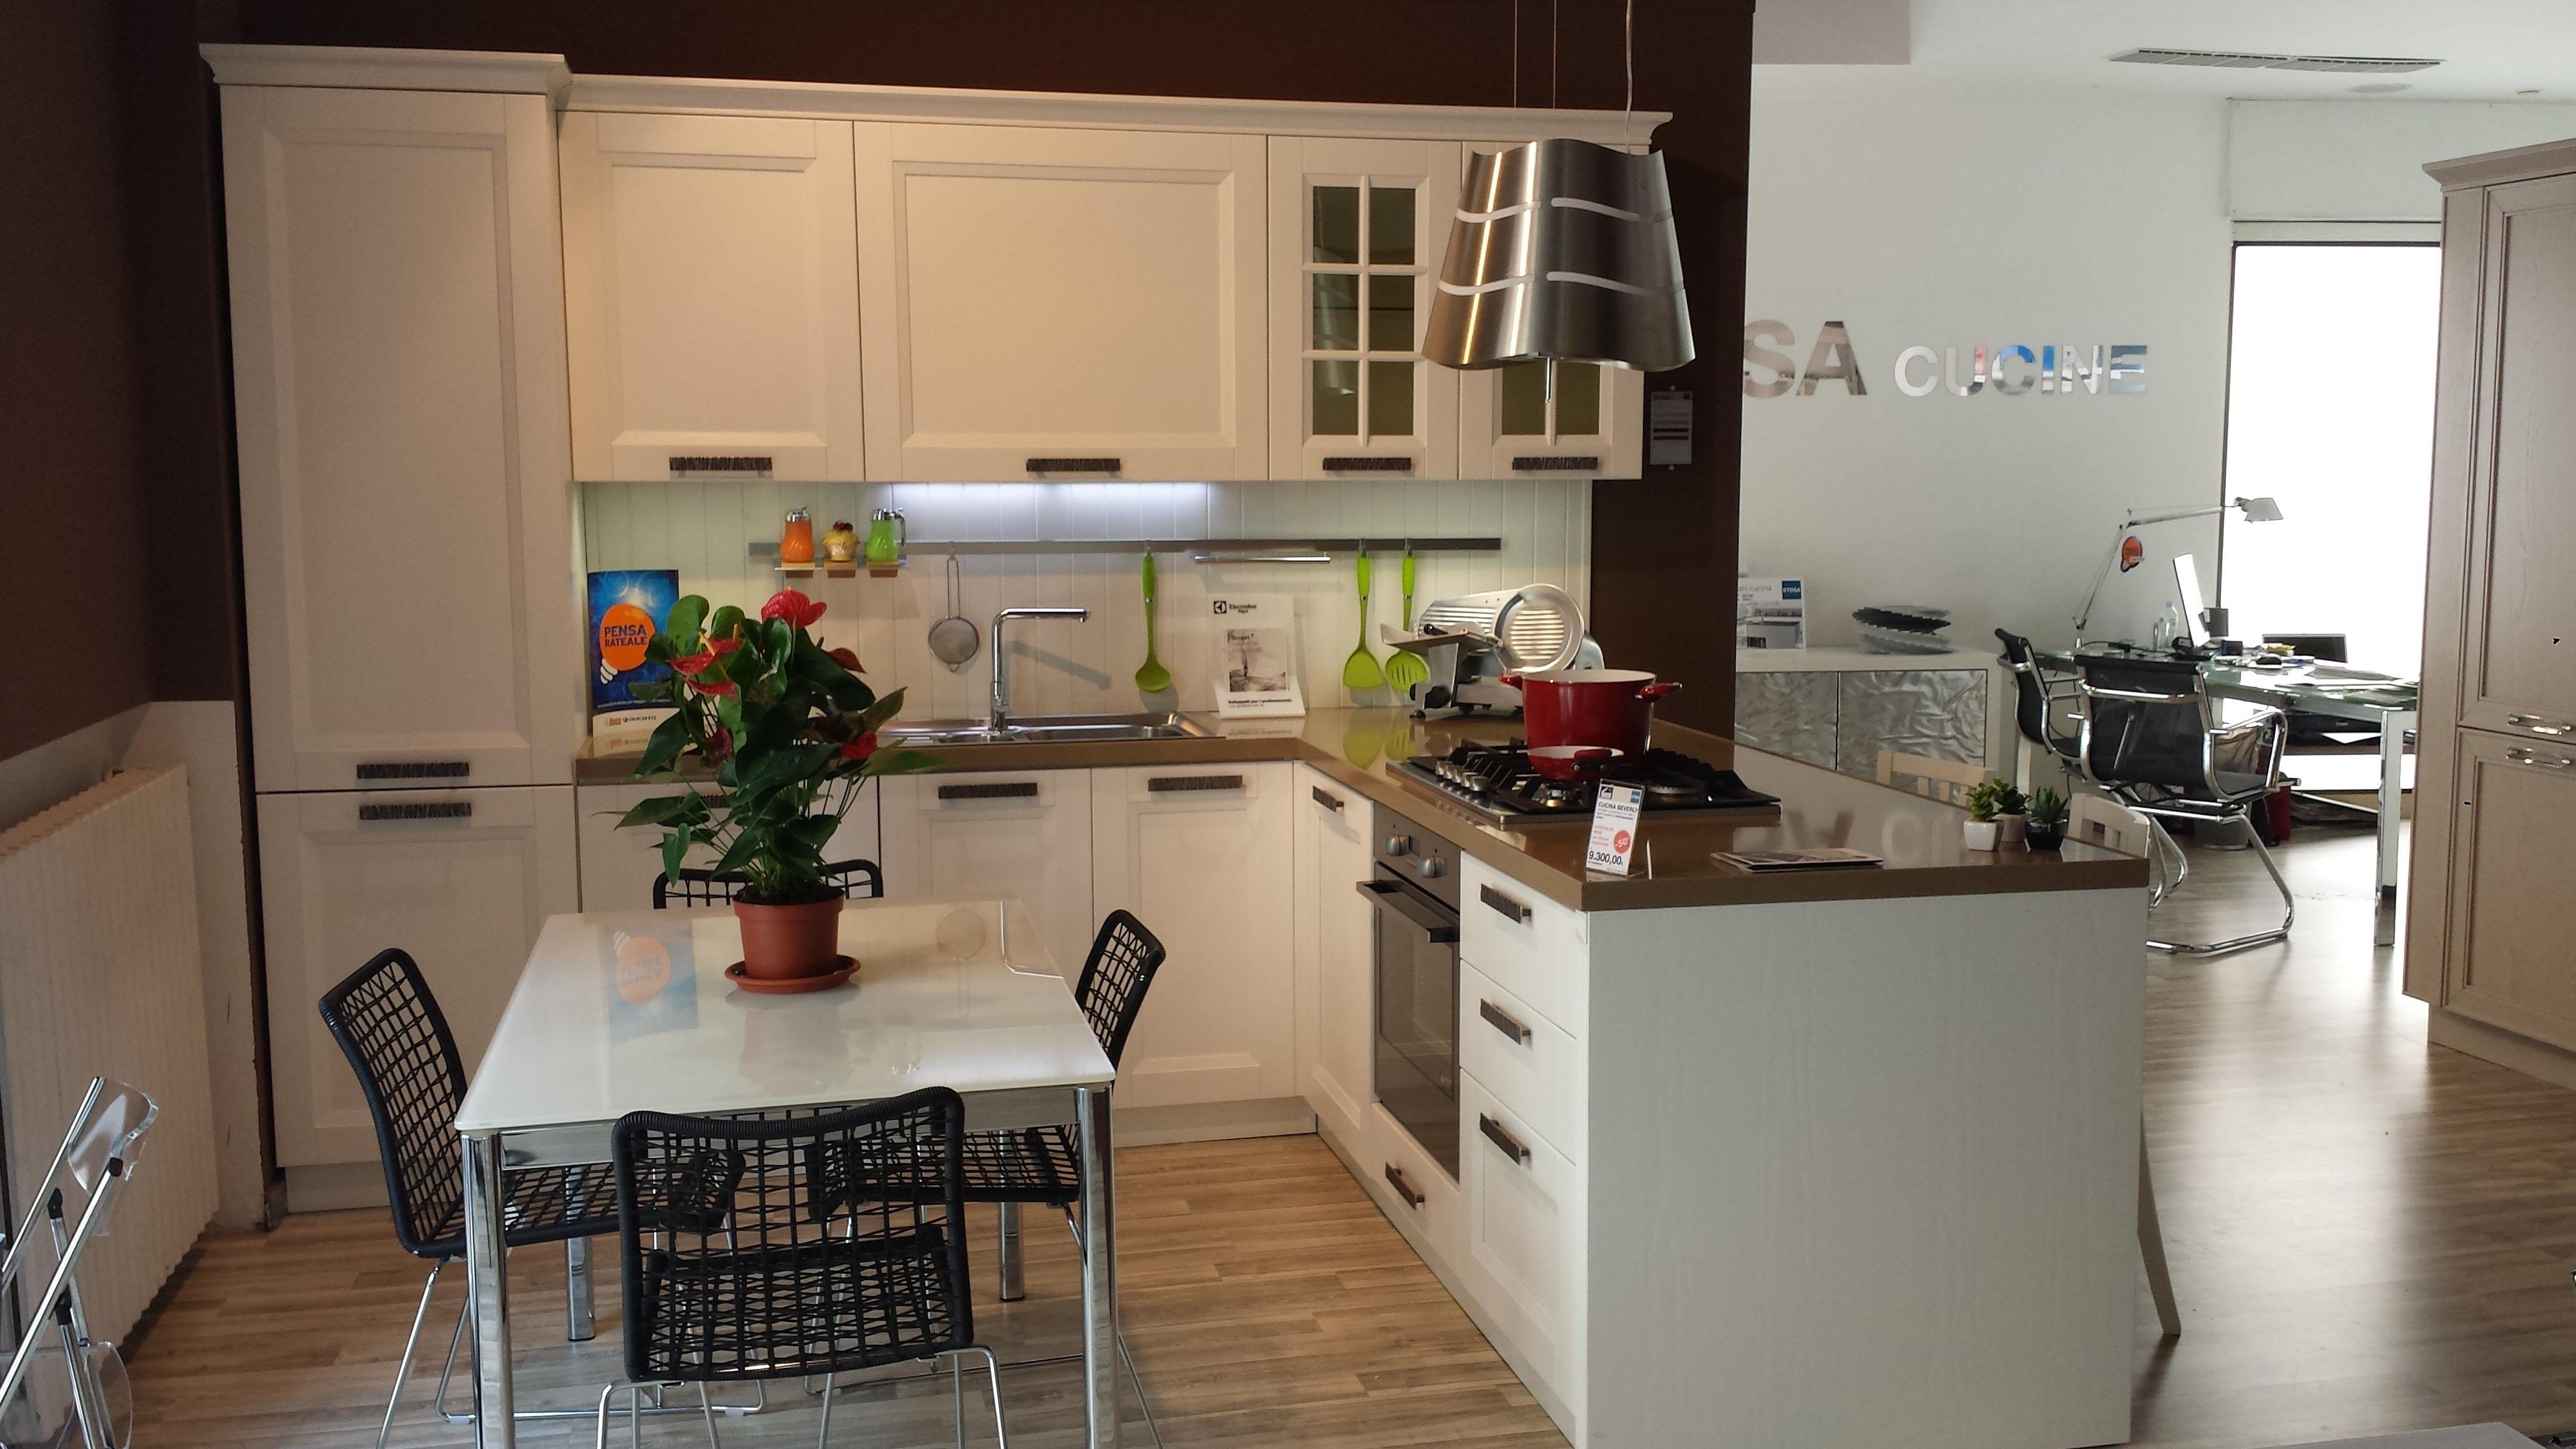 Cucina stosa beverly completa di elettrodomestici cucine a prezzi scontati - Cucina beverly stosa prezzi ...